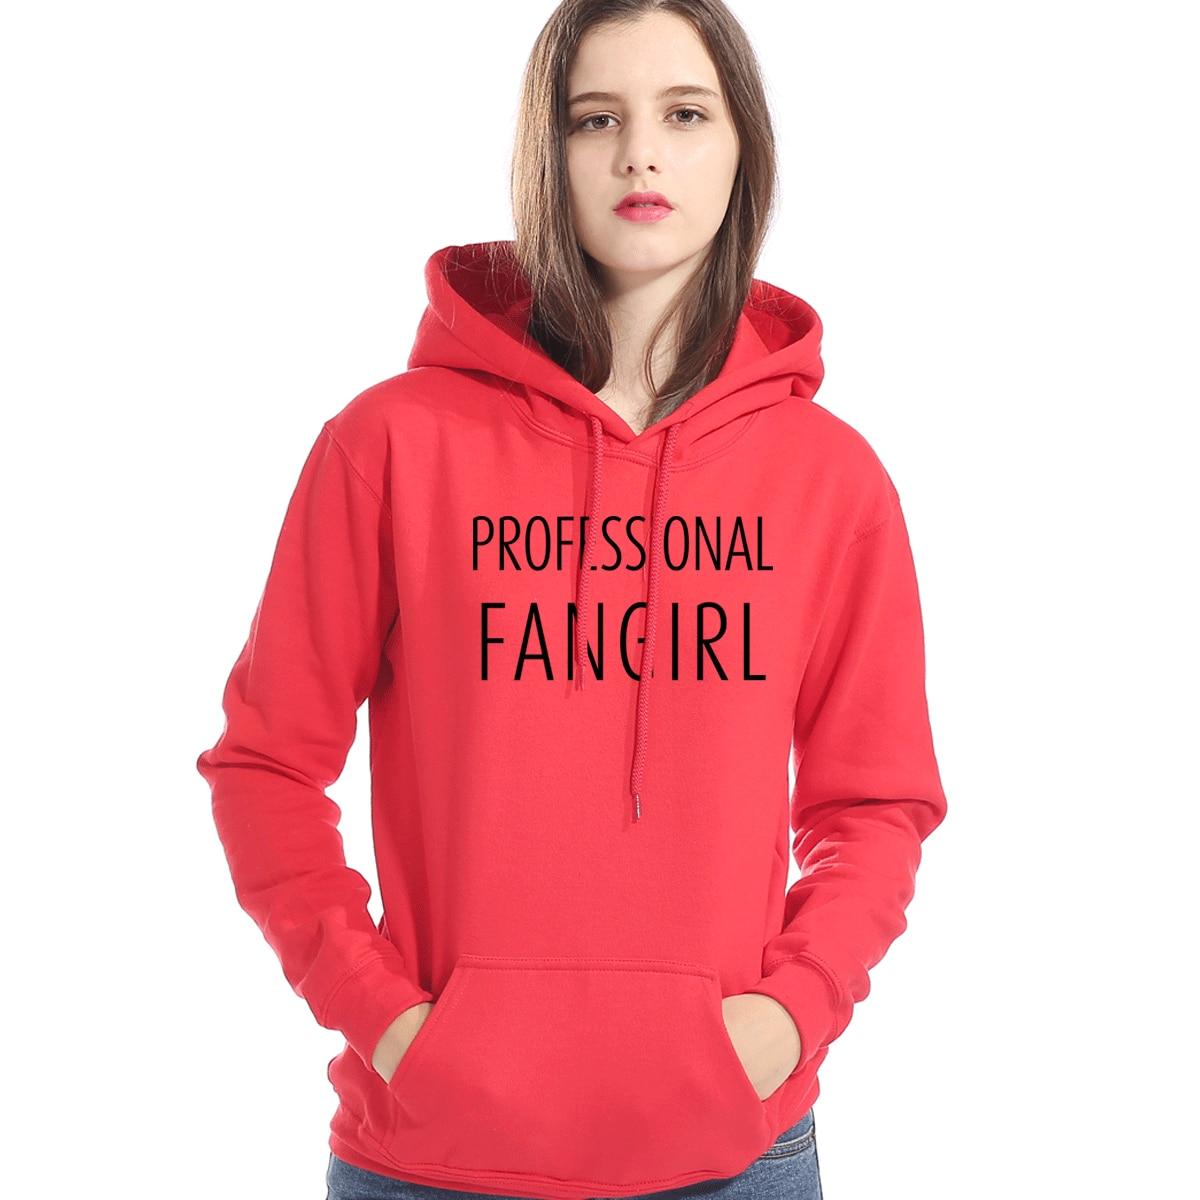 Streetwear Womens Clothes 2019 Winter Warm Hoodie Harajuku Sweatshirts Professional Fangirl Print Casual Tracksuits Fashion Coat